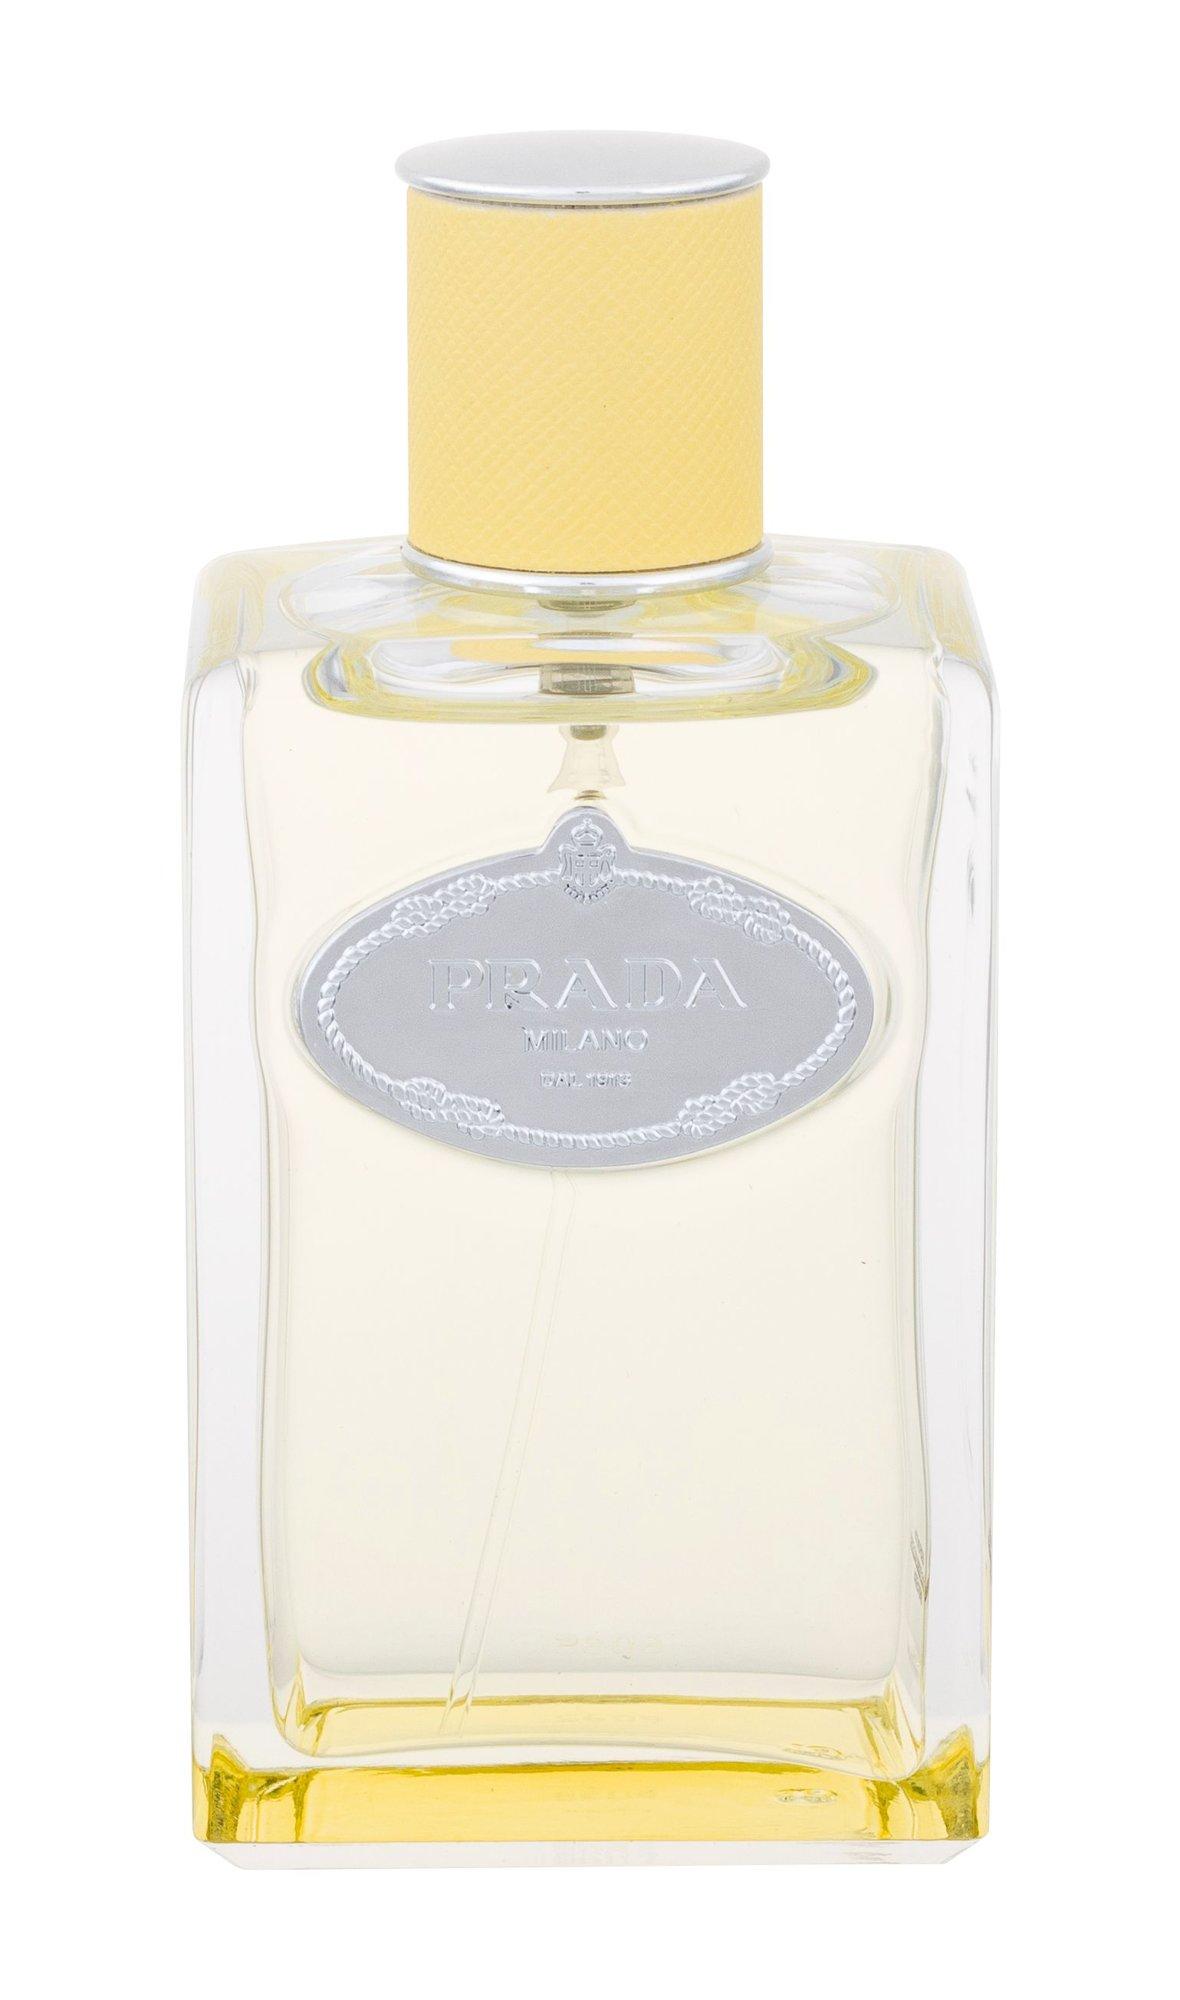 Prada Infusion de Mimosa Eau de Parfum 100ml